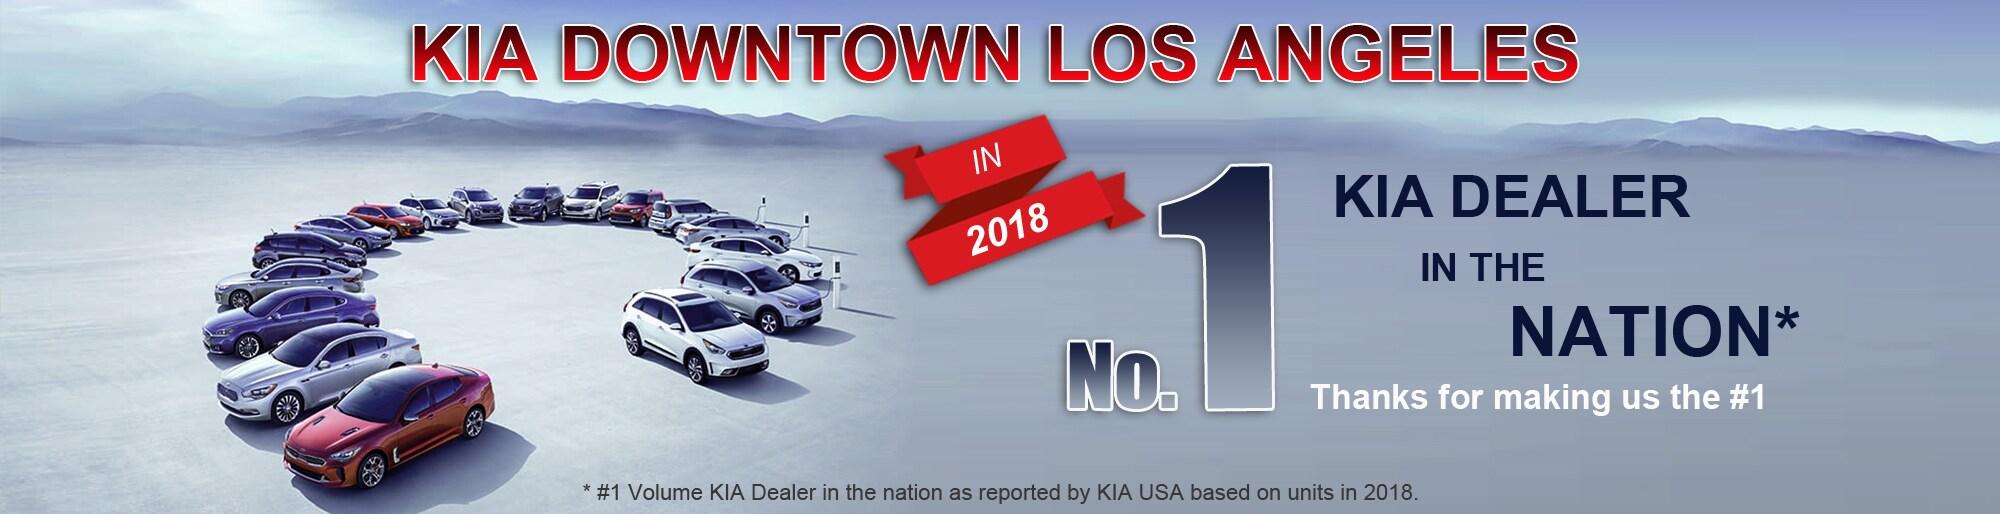 Kia Downtown Los Angeles New Used Kia Dealer Los Angeles Ca